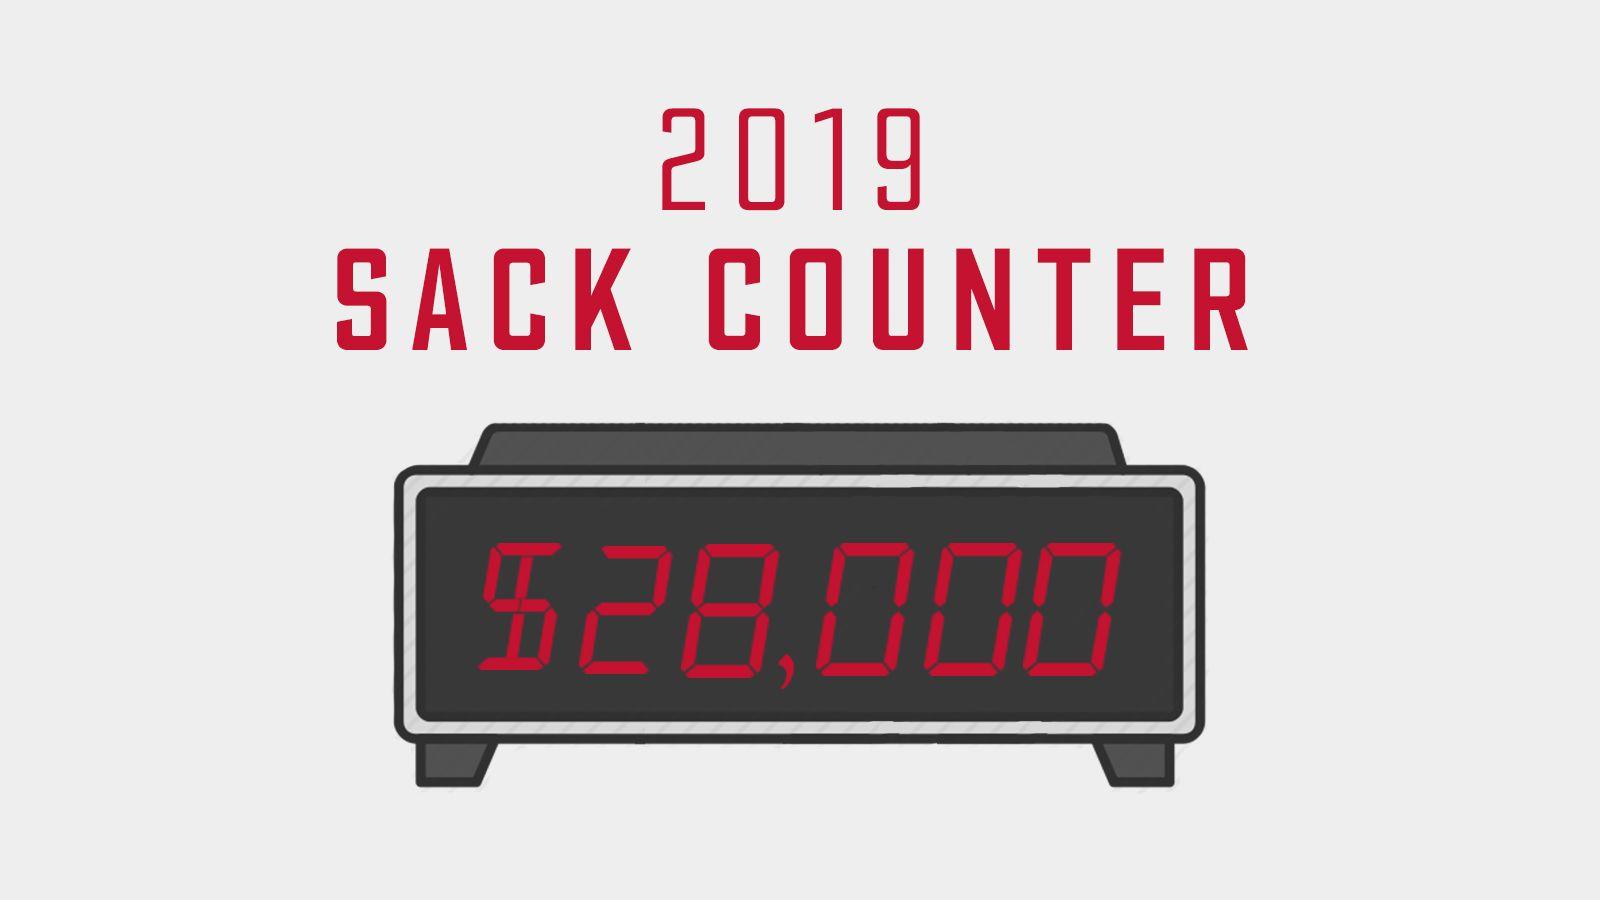 Sack Counter